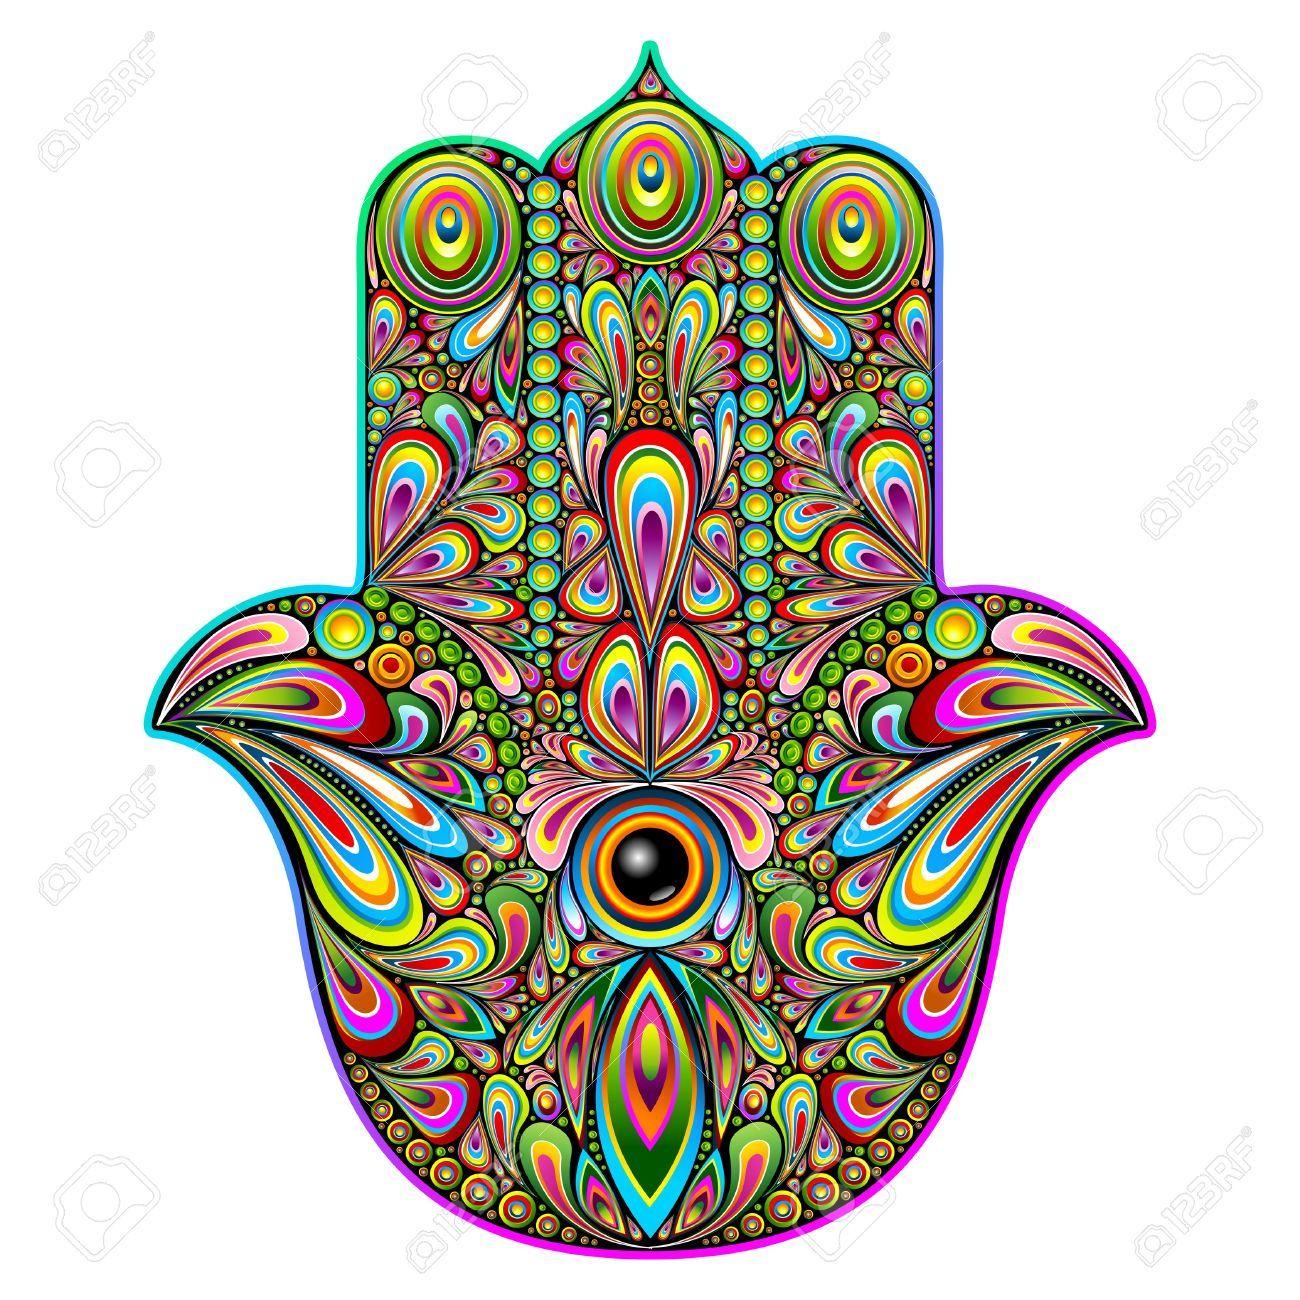 Hamsa Hand Psychedelic Art Royalty Free Cliparts Vectors